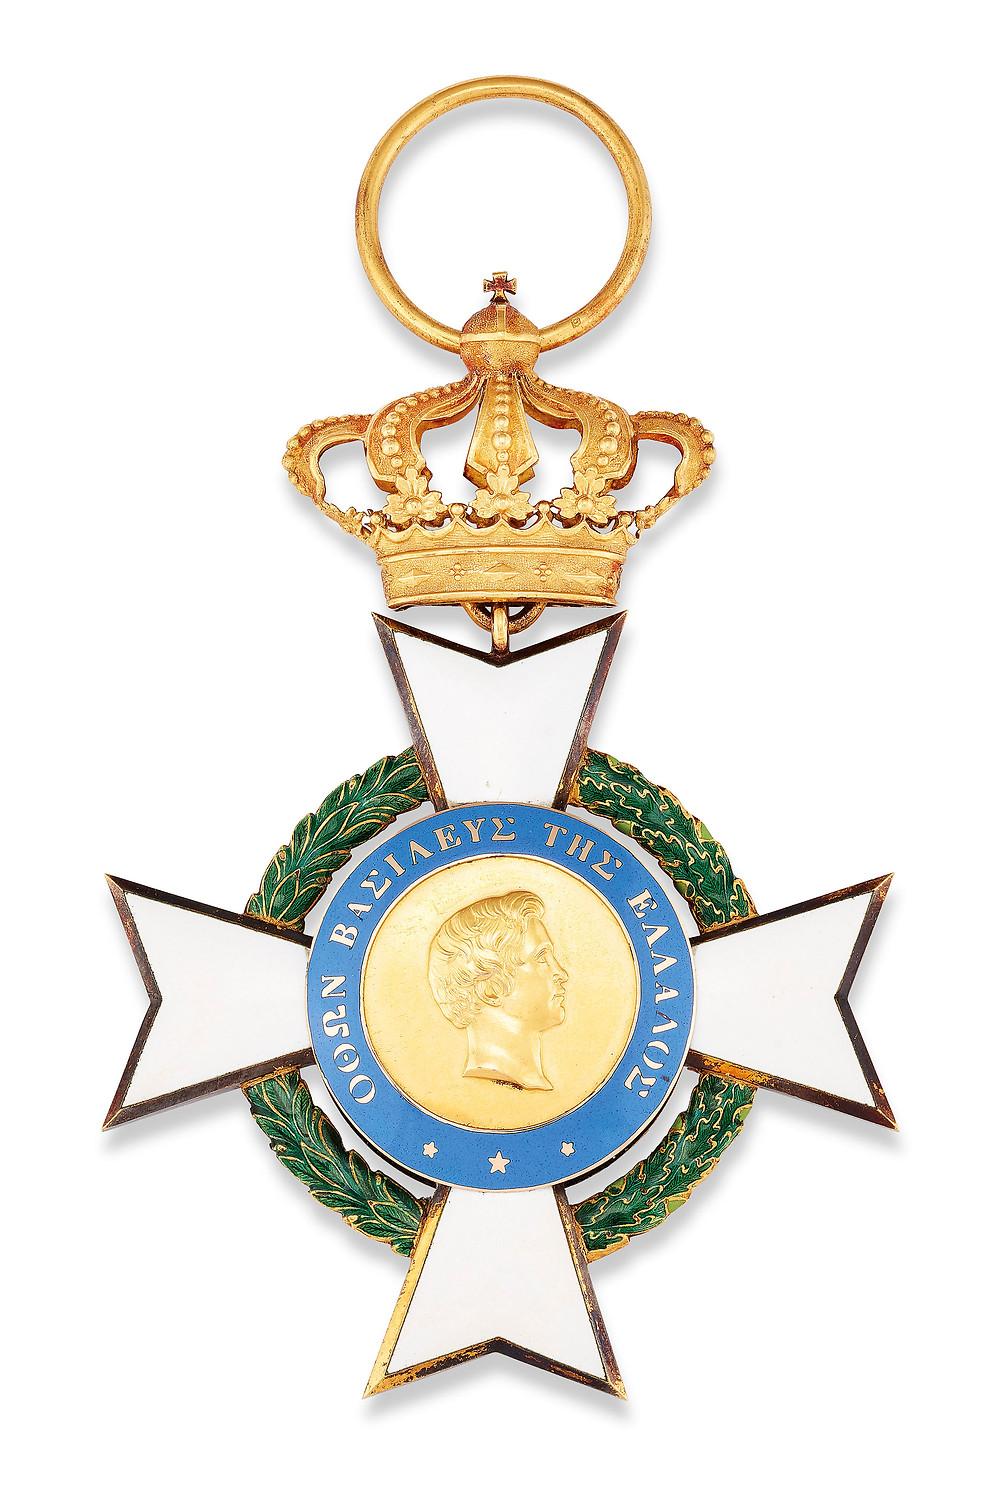 GREECE, ORDER OF THE REDEEMER, BADGE. Maltese cross, greek cross. Royal family, royal collection. British monarchy